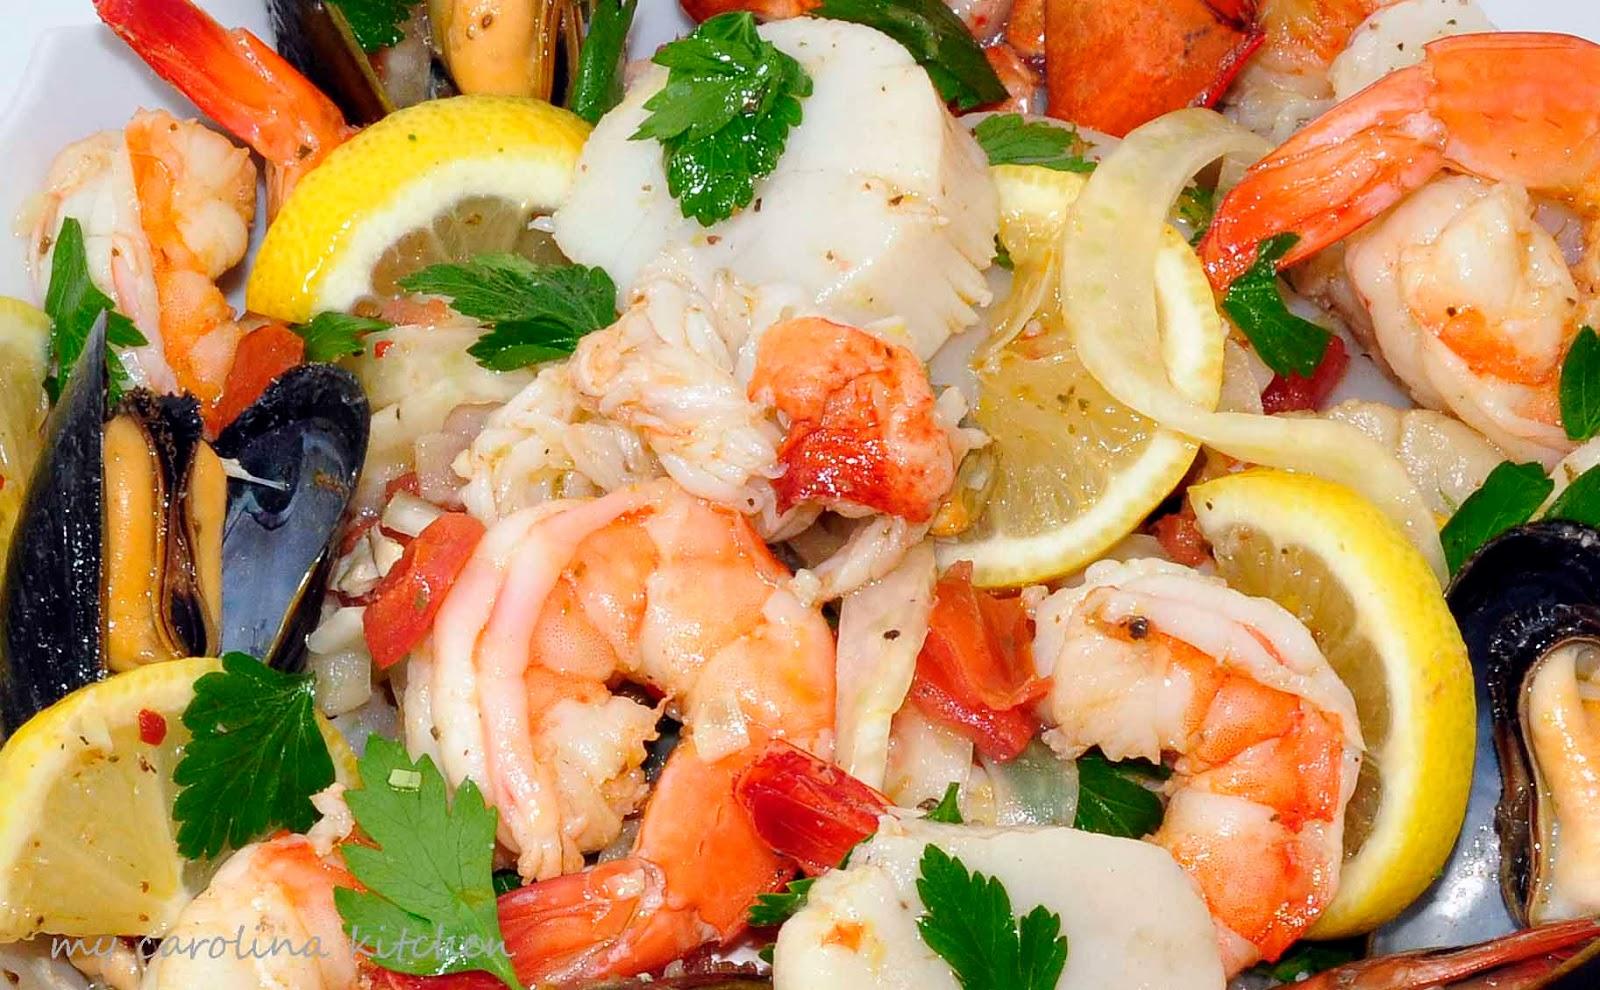 My Carolina Kitchen: Italian Seafood Salad